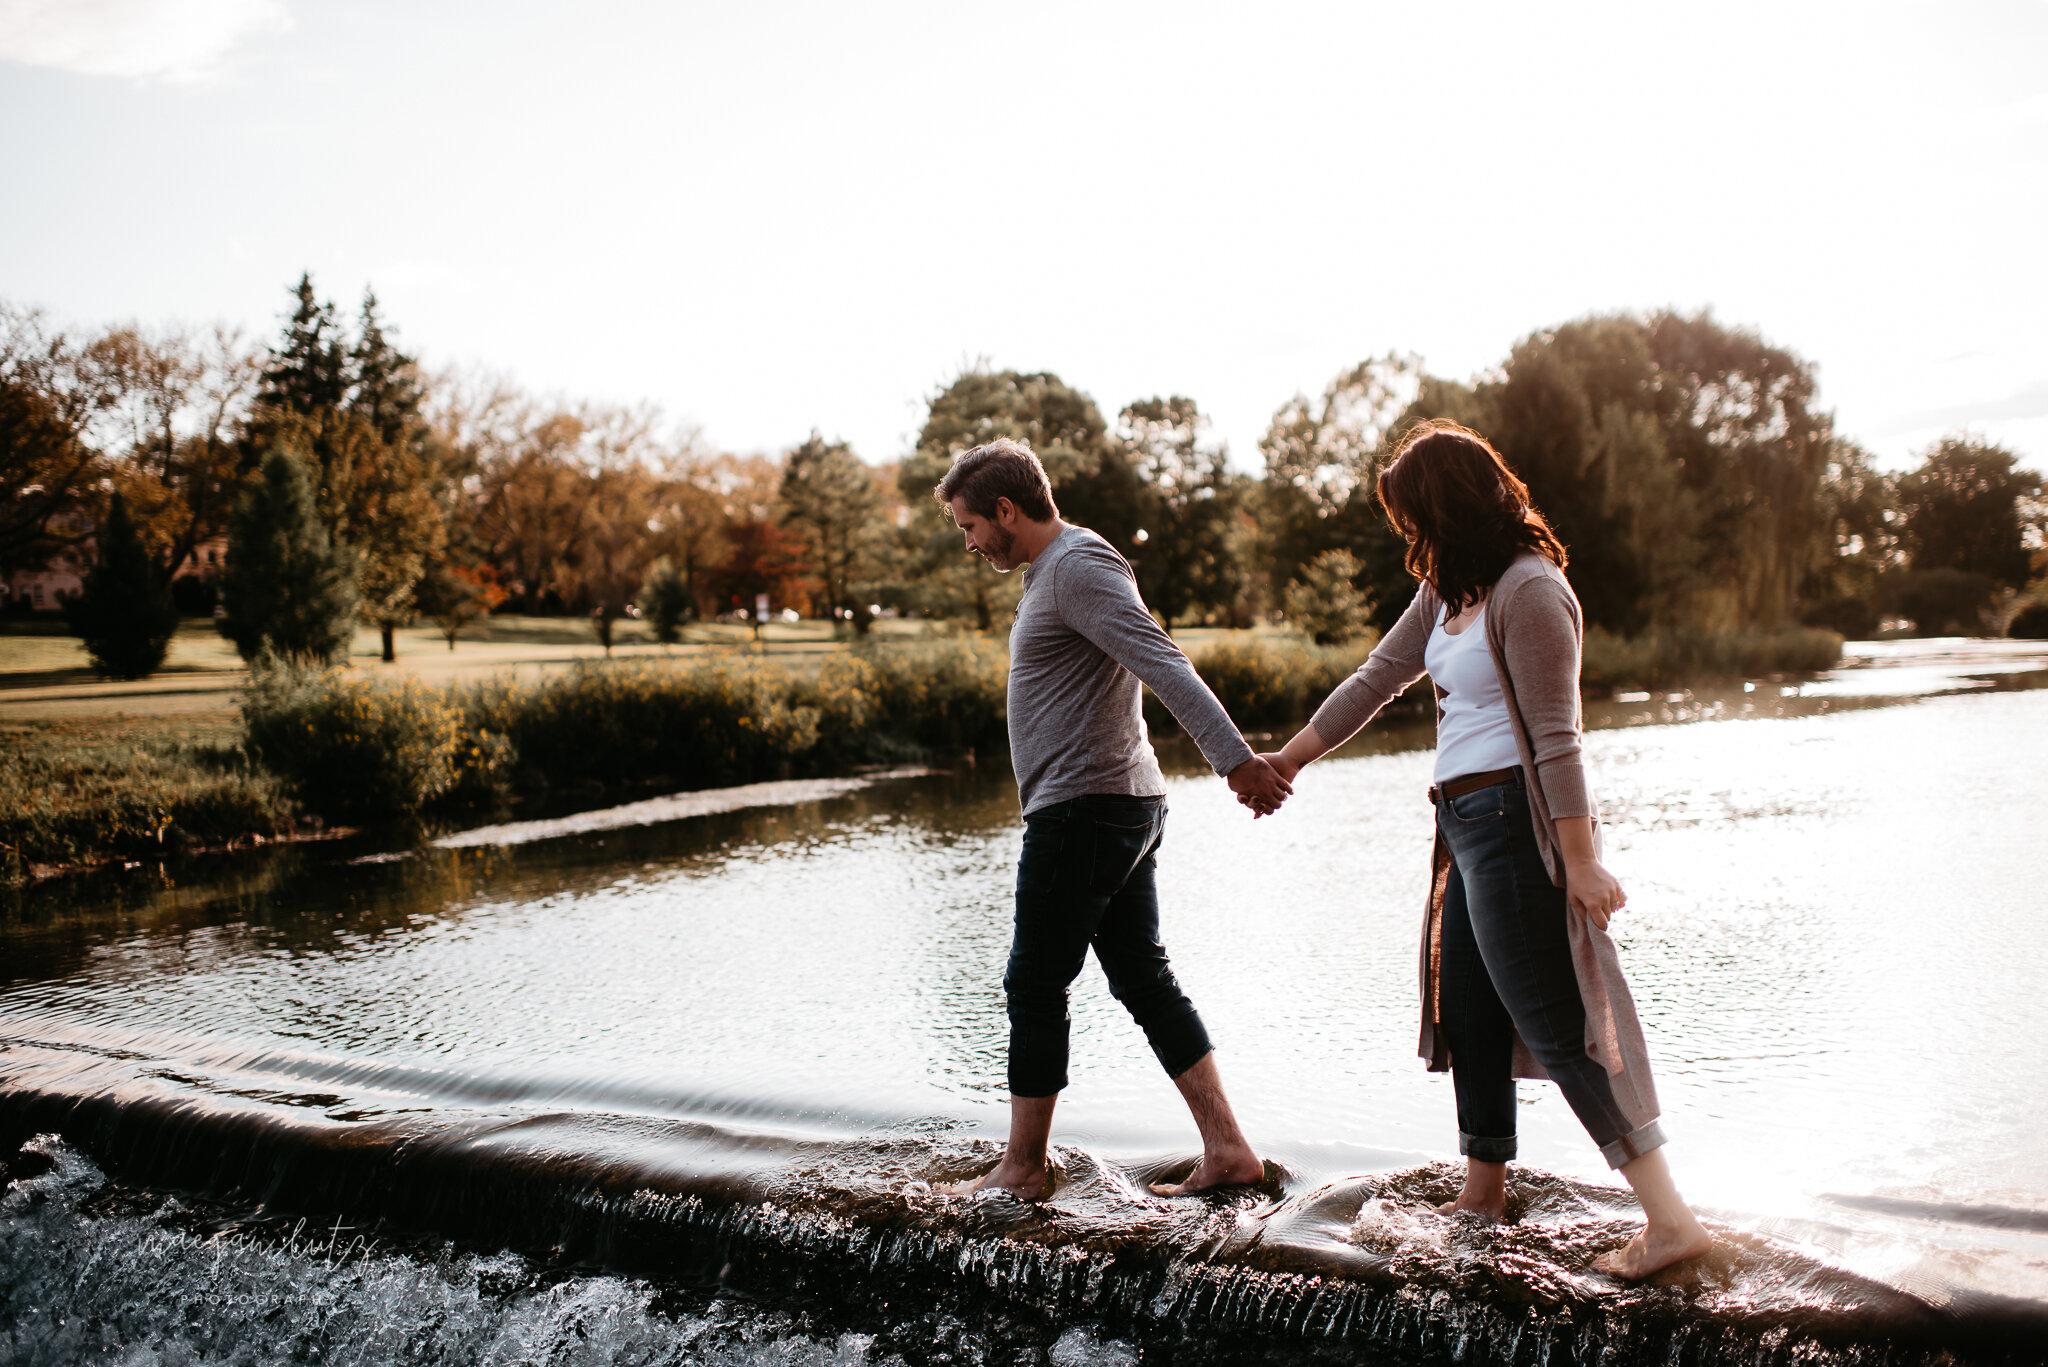 NEPA-Lehigh-Valley-Wedding-Engagement-photographer-at-the-rose-garden-allentown-PA-9.jpg